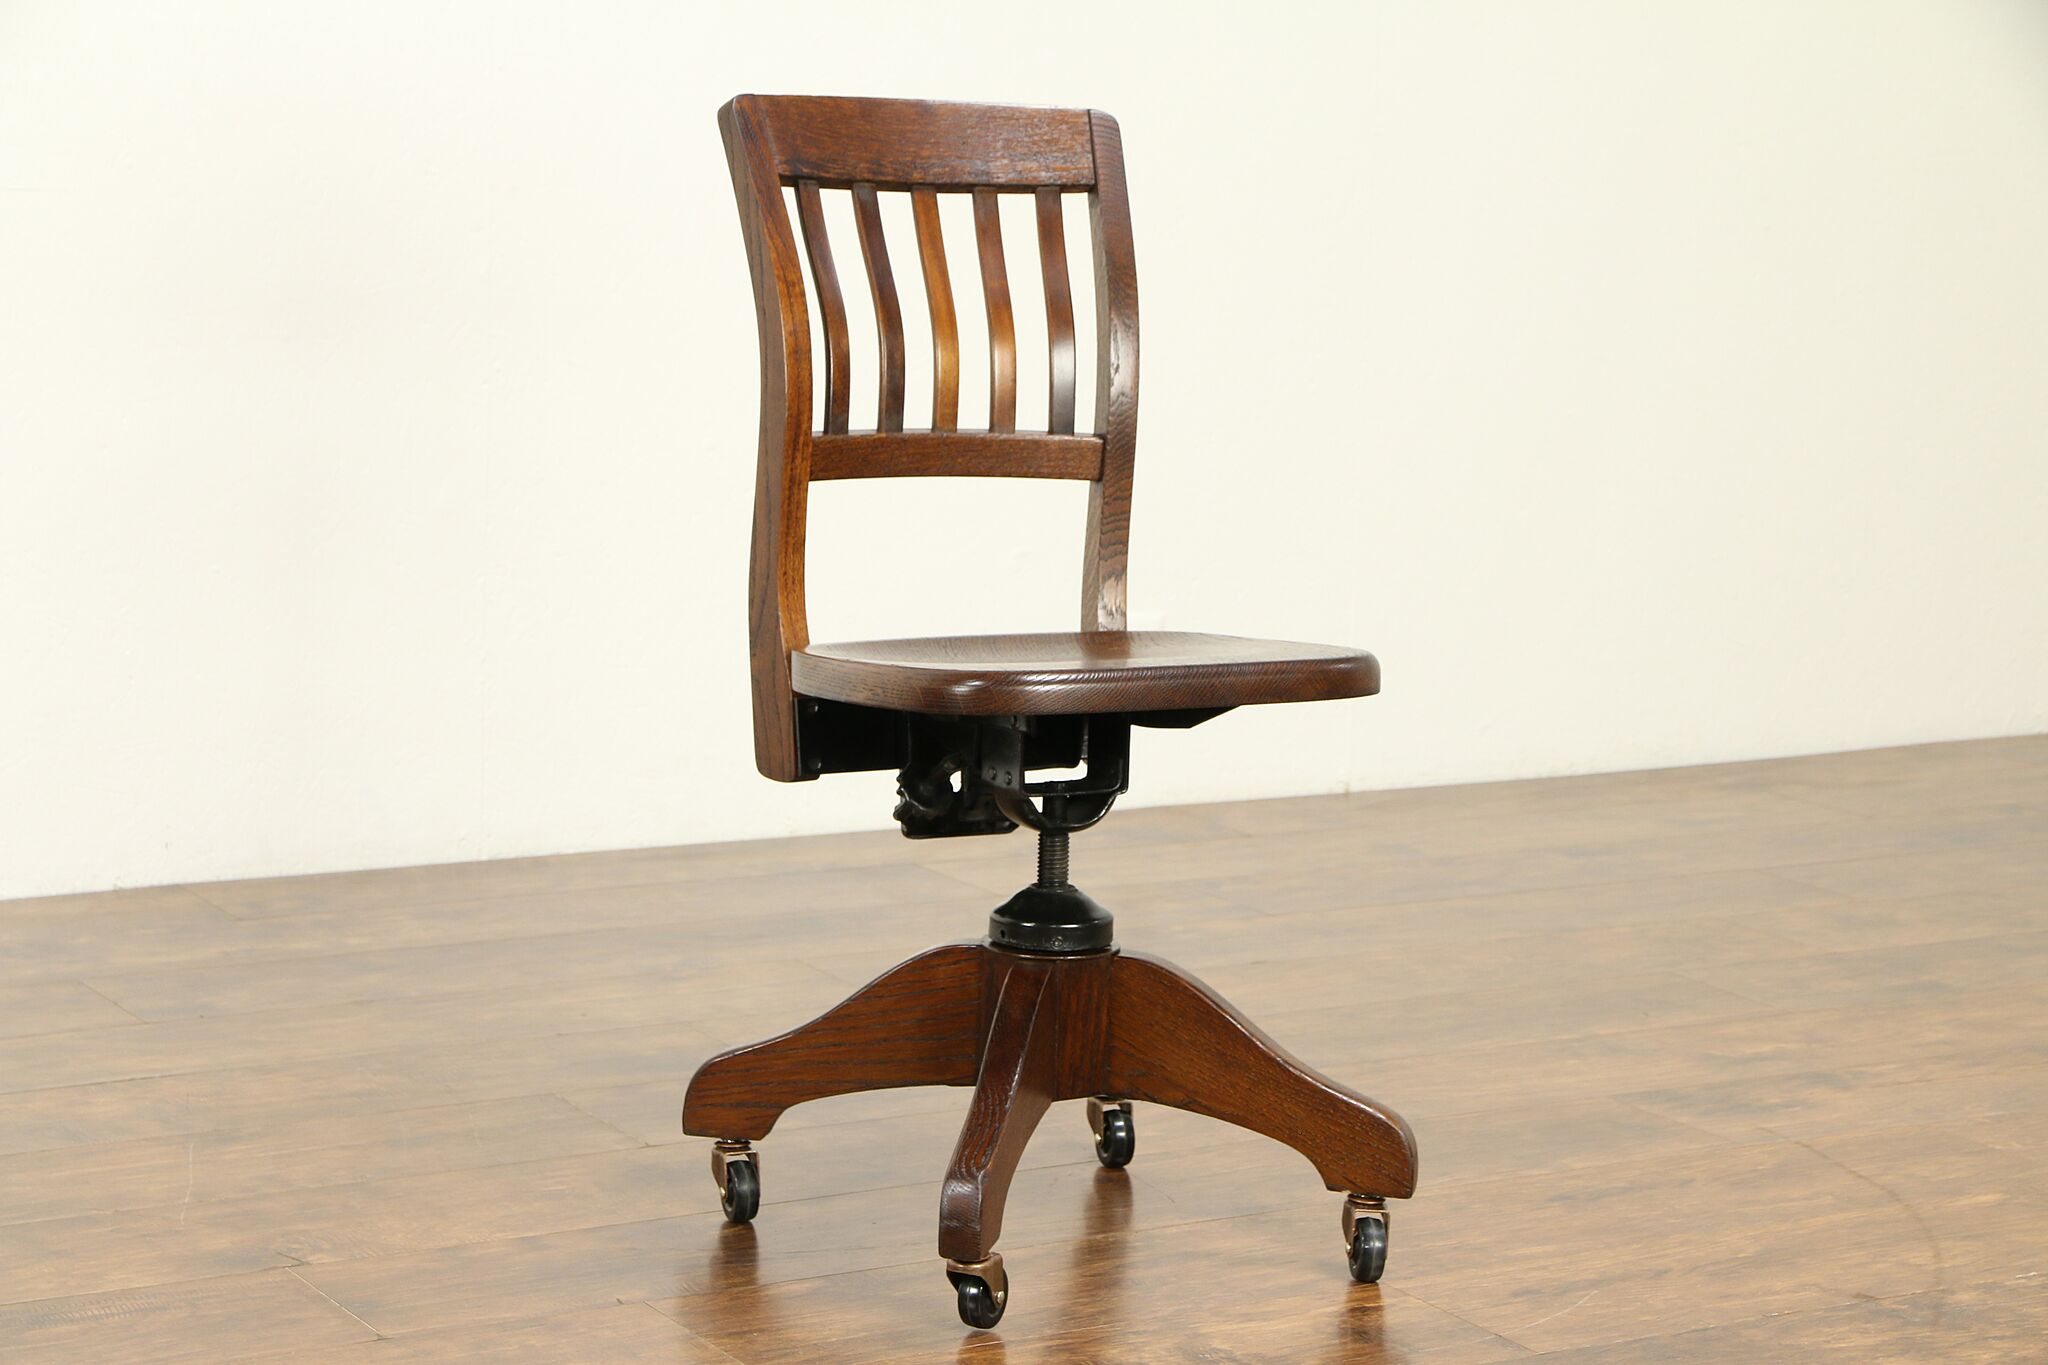 Enjoyable Oak Quarter Sawn Antique Swivel Adjustable Desk Chair Milwaukee 32066 Gamerscity Chair Design For Home Gamerscityorg